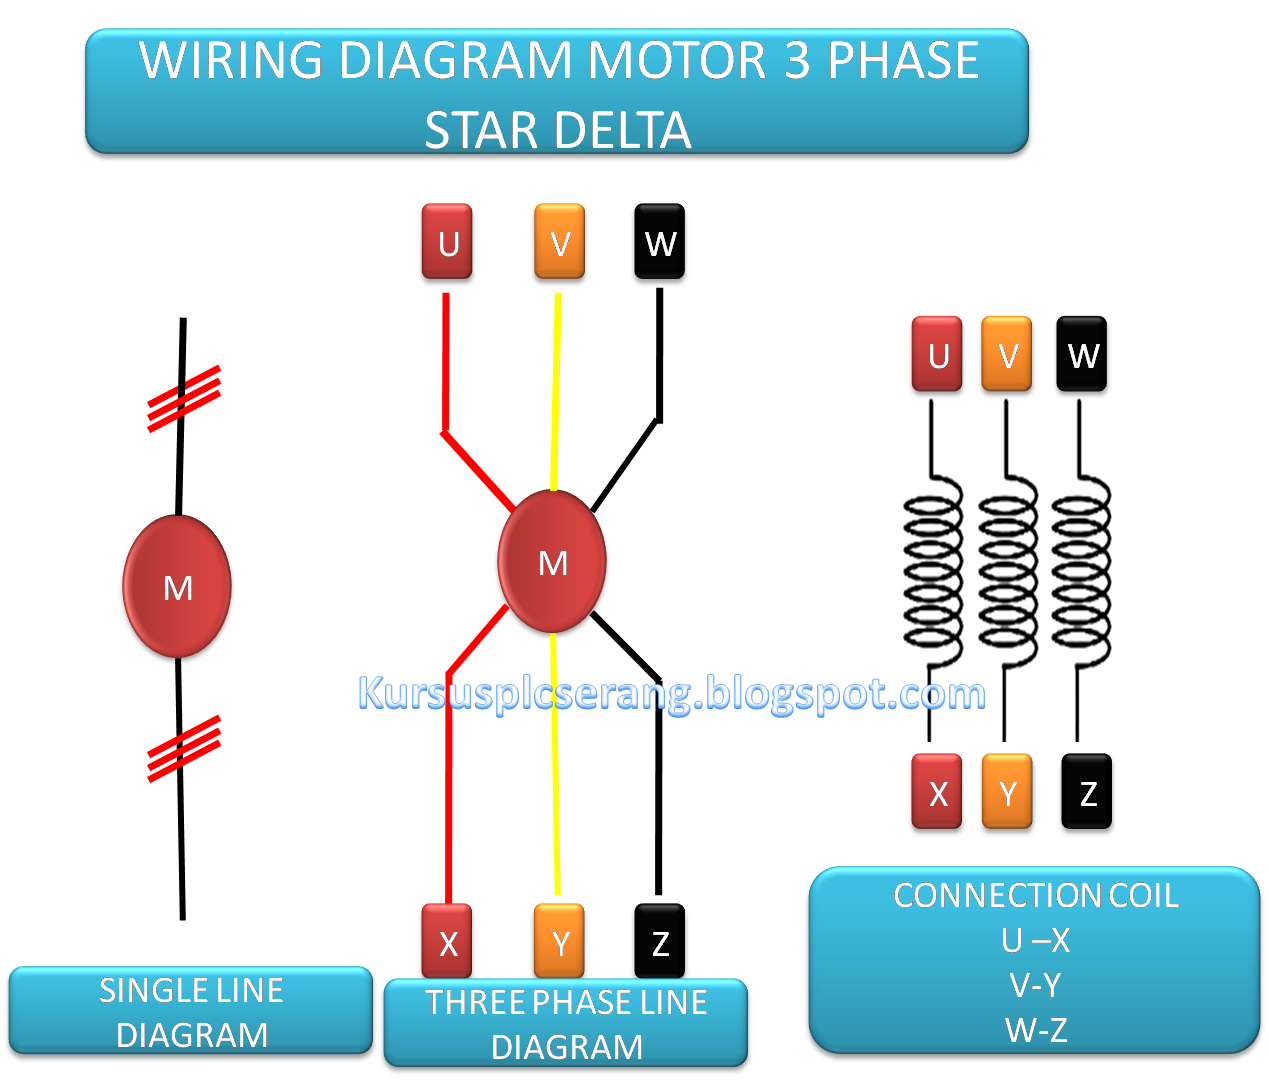 3 Phase Star Delta Motor Wiring Diagram Animal And Plant Cell Worksheet Rangkaian Privat Plc Belajar